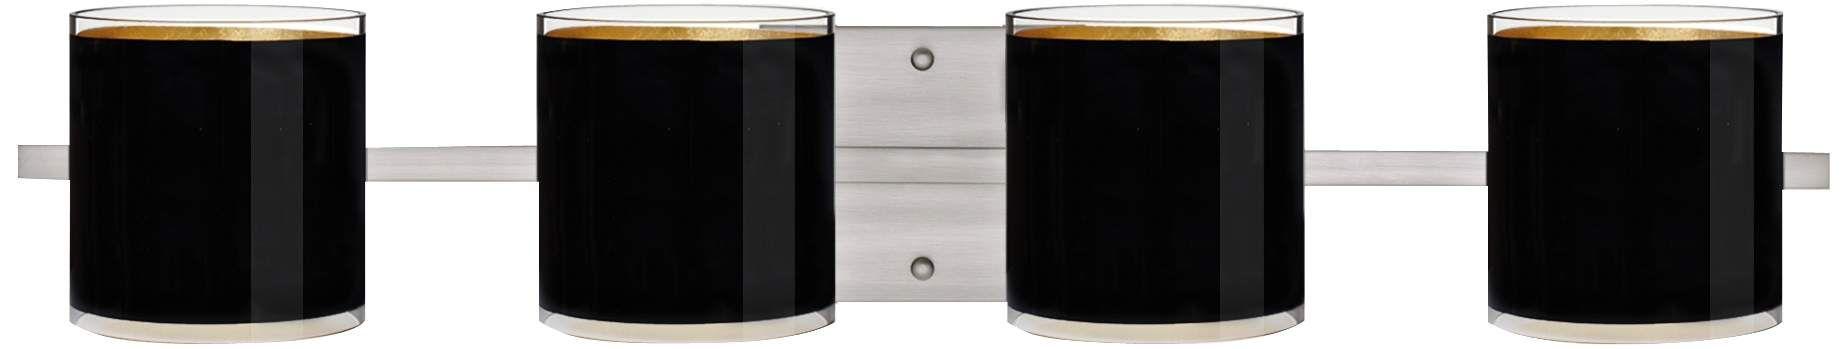 Photo of Besa Pogo 31 Inch Wide Black Bathroom Light